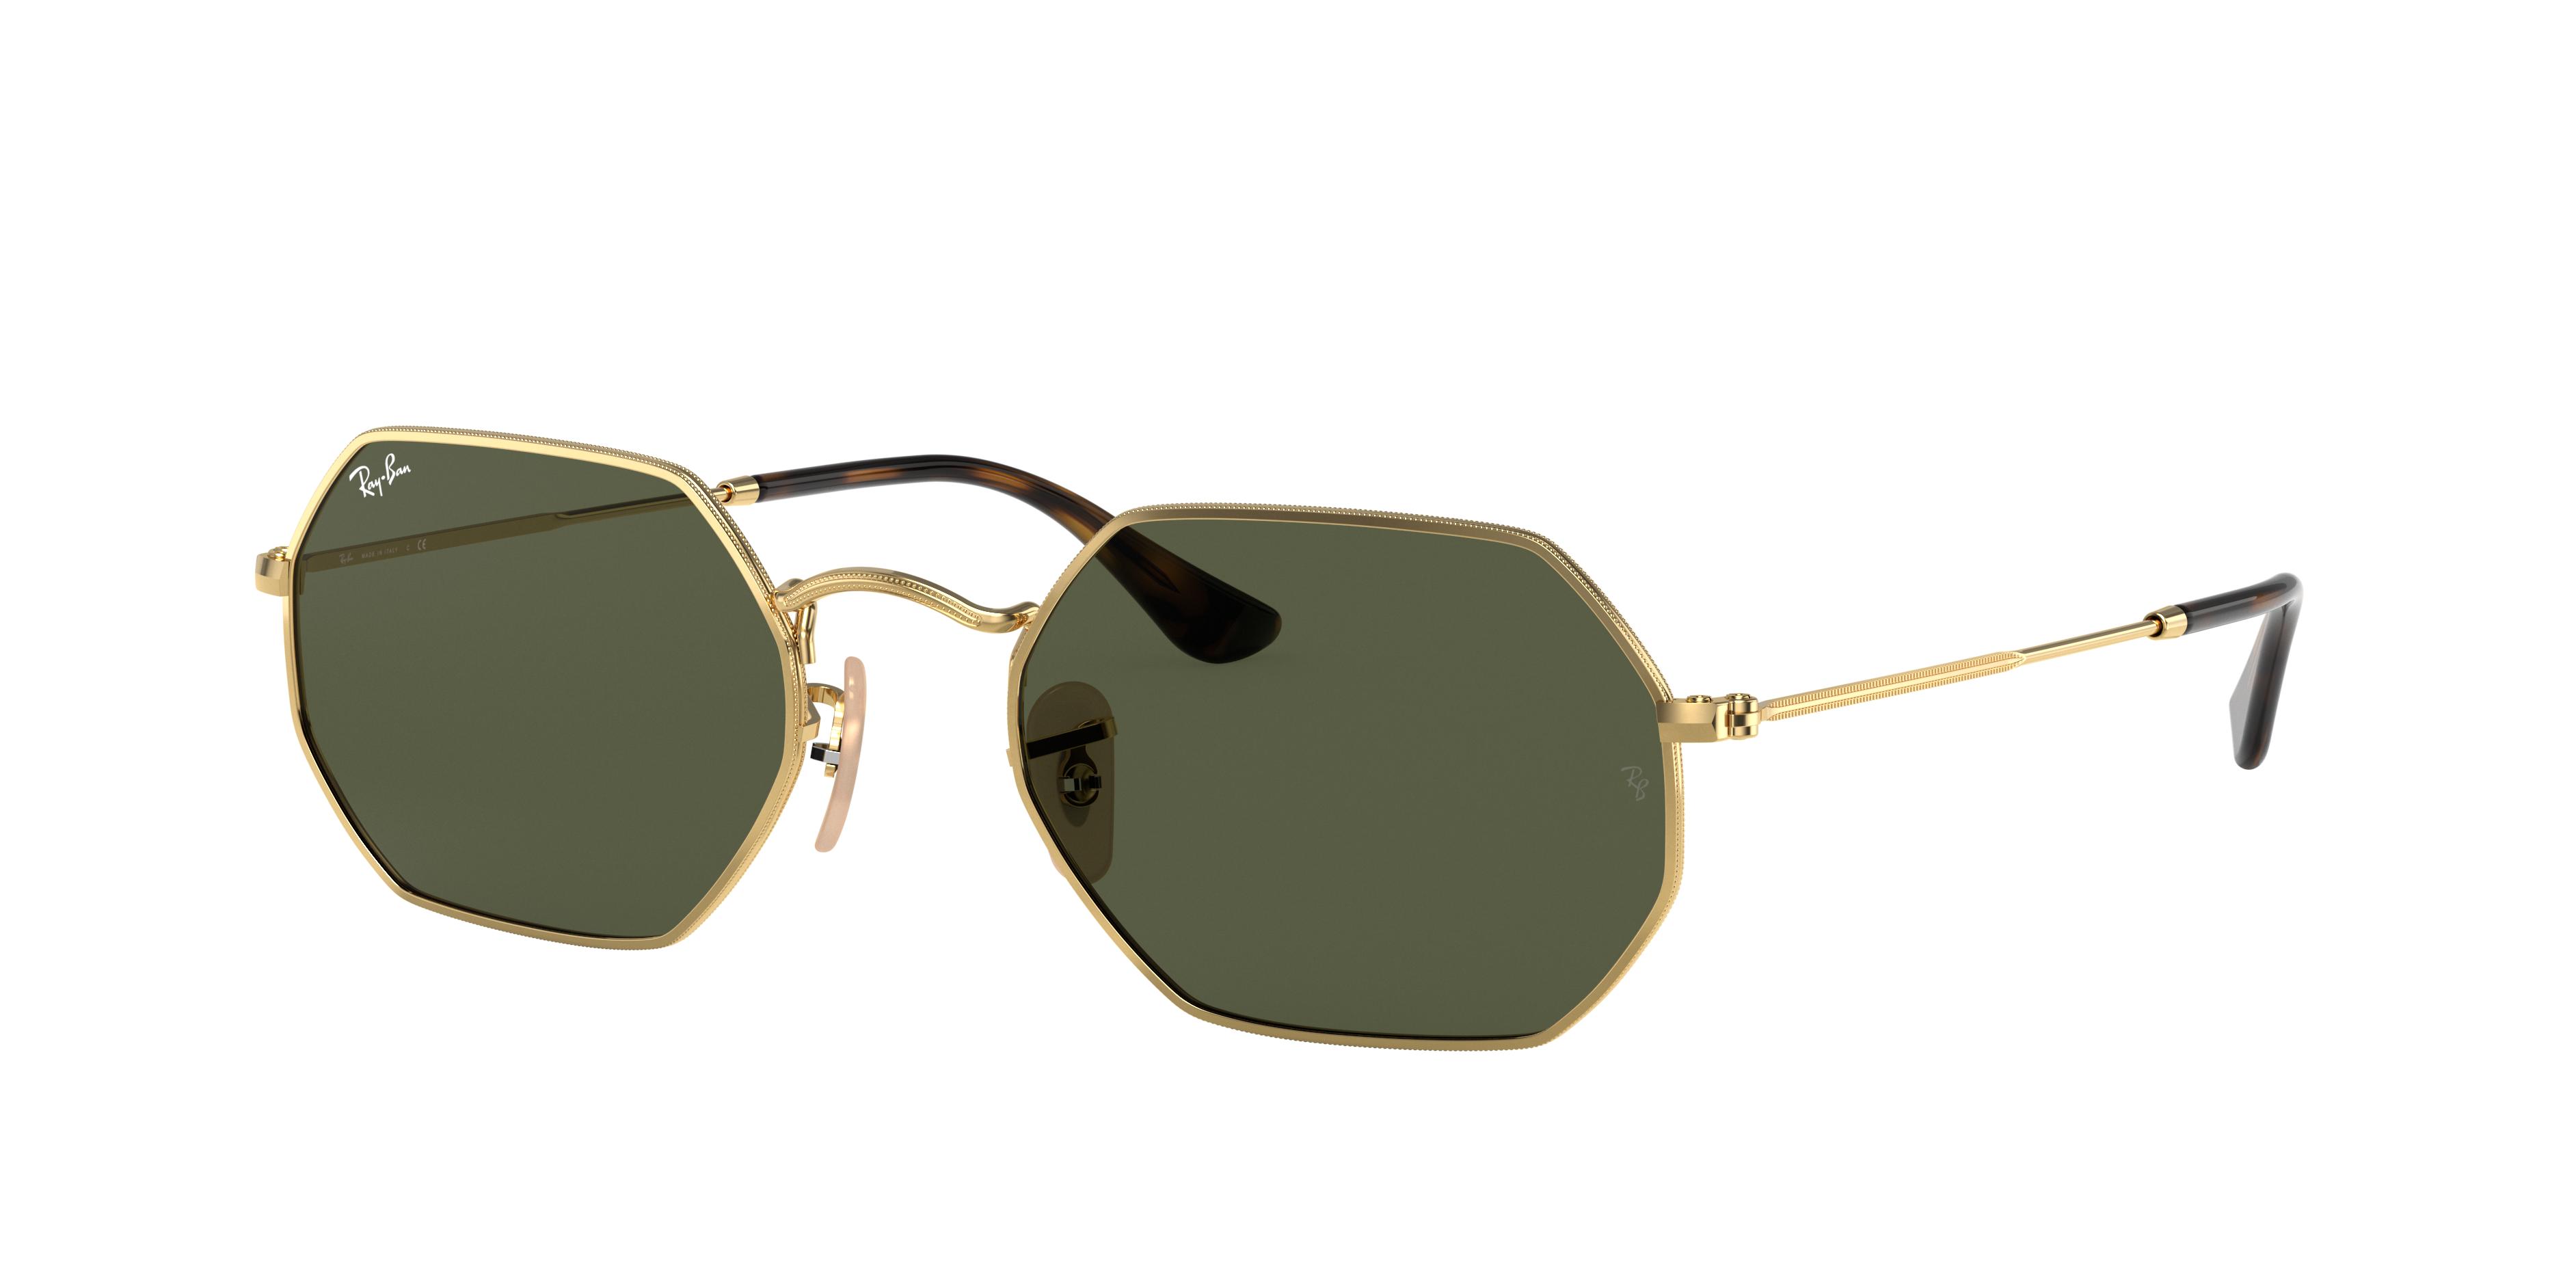 Ray-Ban Octagonal Classic Gold, Green Lenses - RB3556N